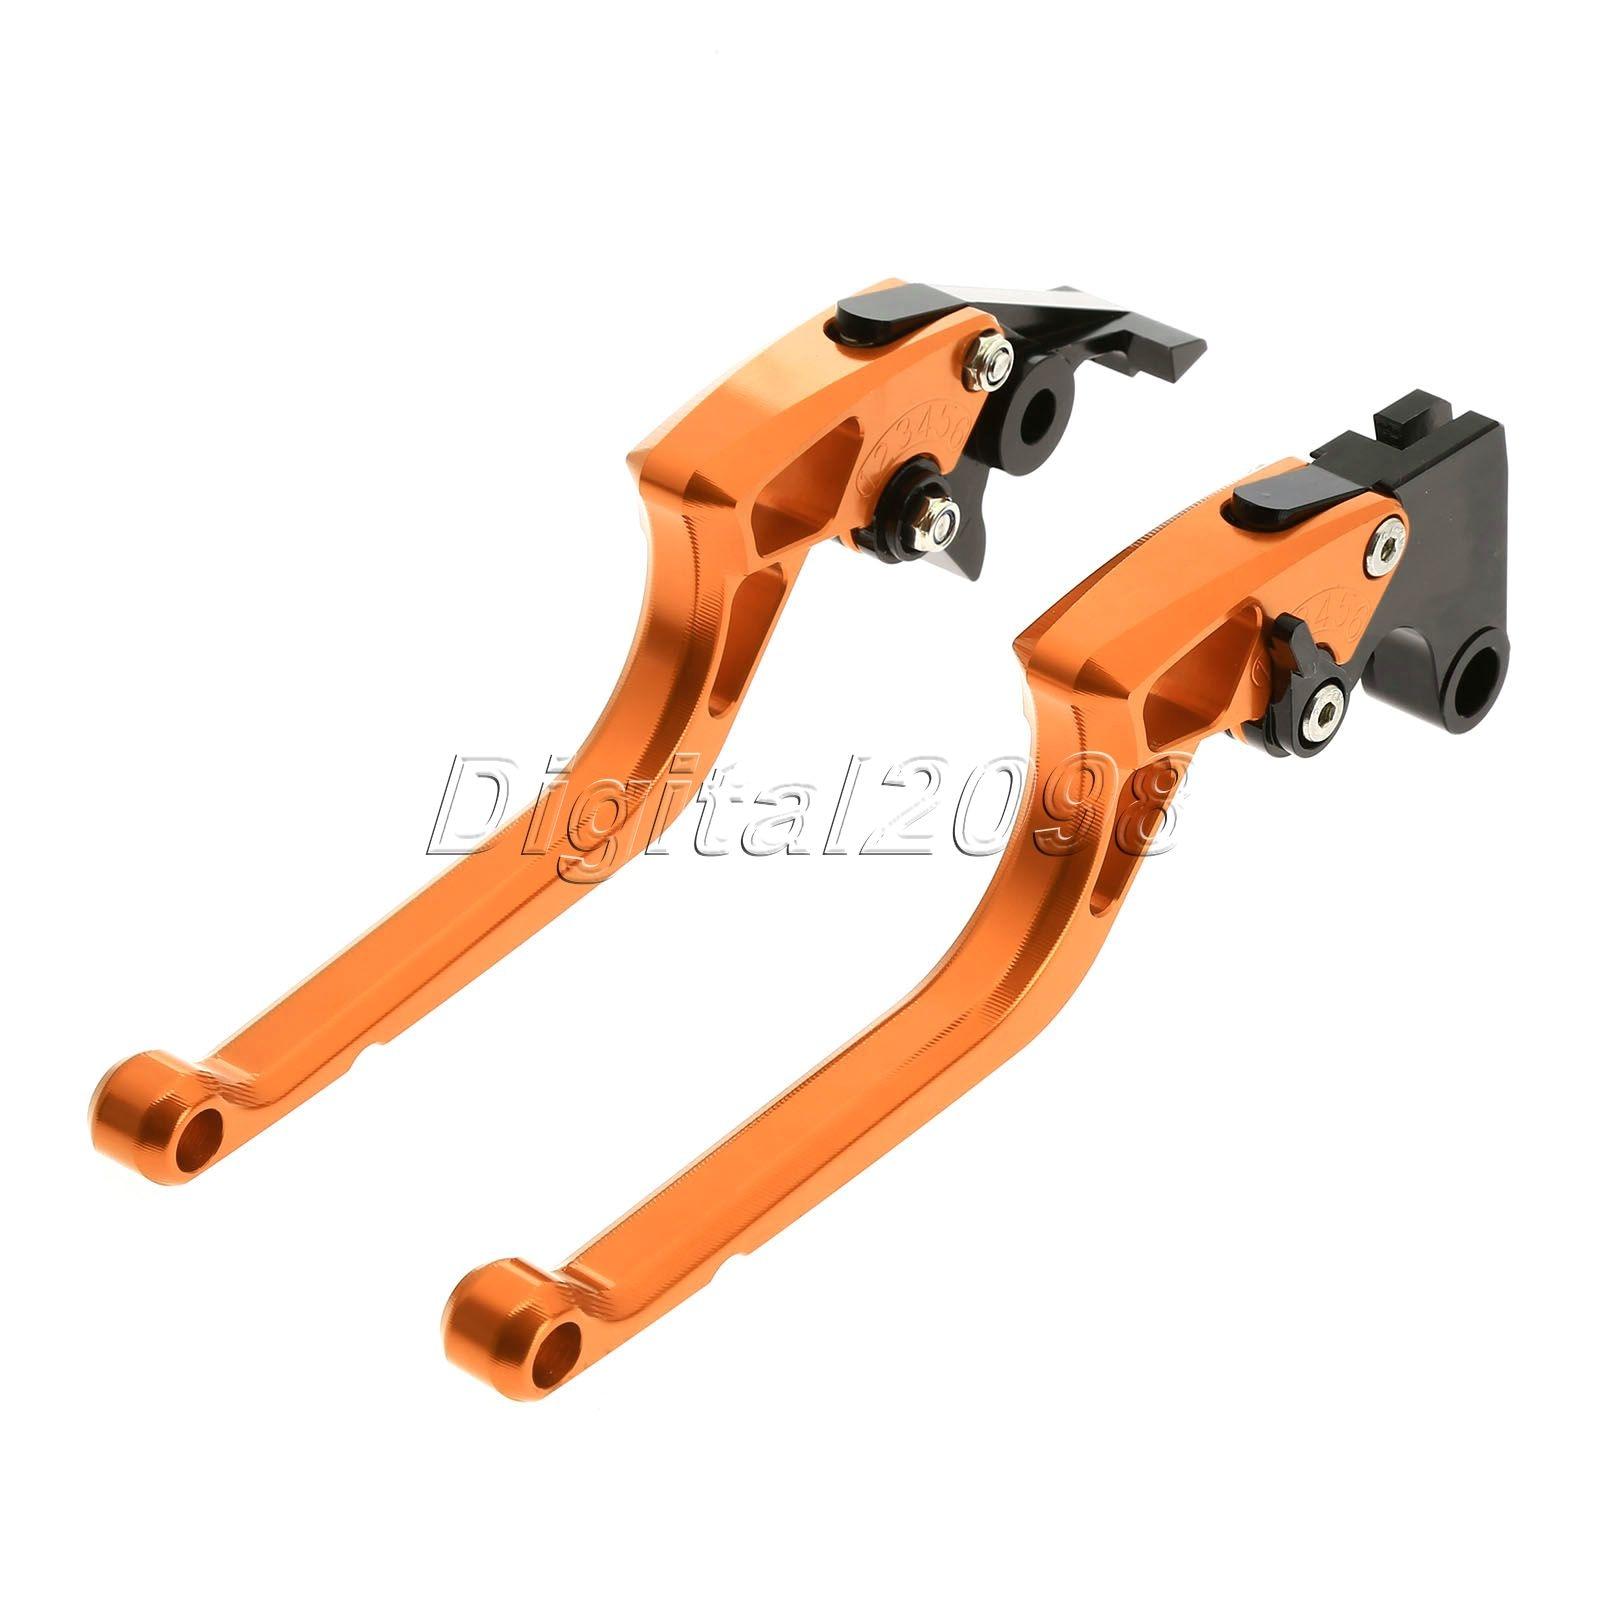 New Brake Clutch Levers CNC Adjustable Motorbike Levers for Honda GROM 2014,CBR250R 2011-2013,CBR300R 2014-2015,CBR500R/CB500F/X billet new alu long folding adjustable brake clutch levers for honda cbr250r cbr 250 r 11 13 cbr300r 14 cbr500r cb500f x 13 14